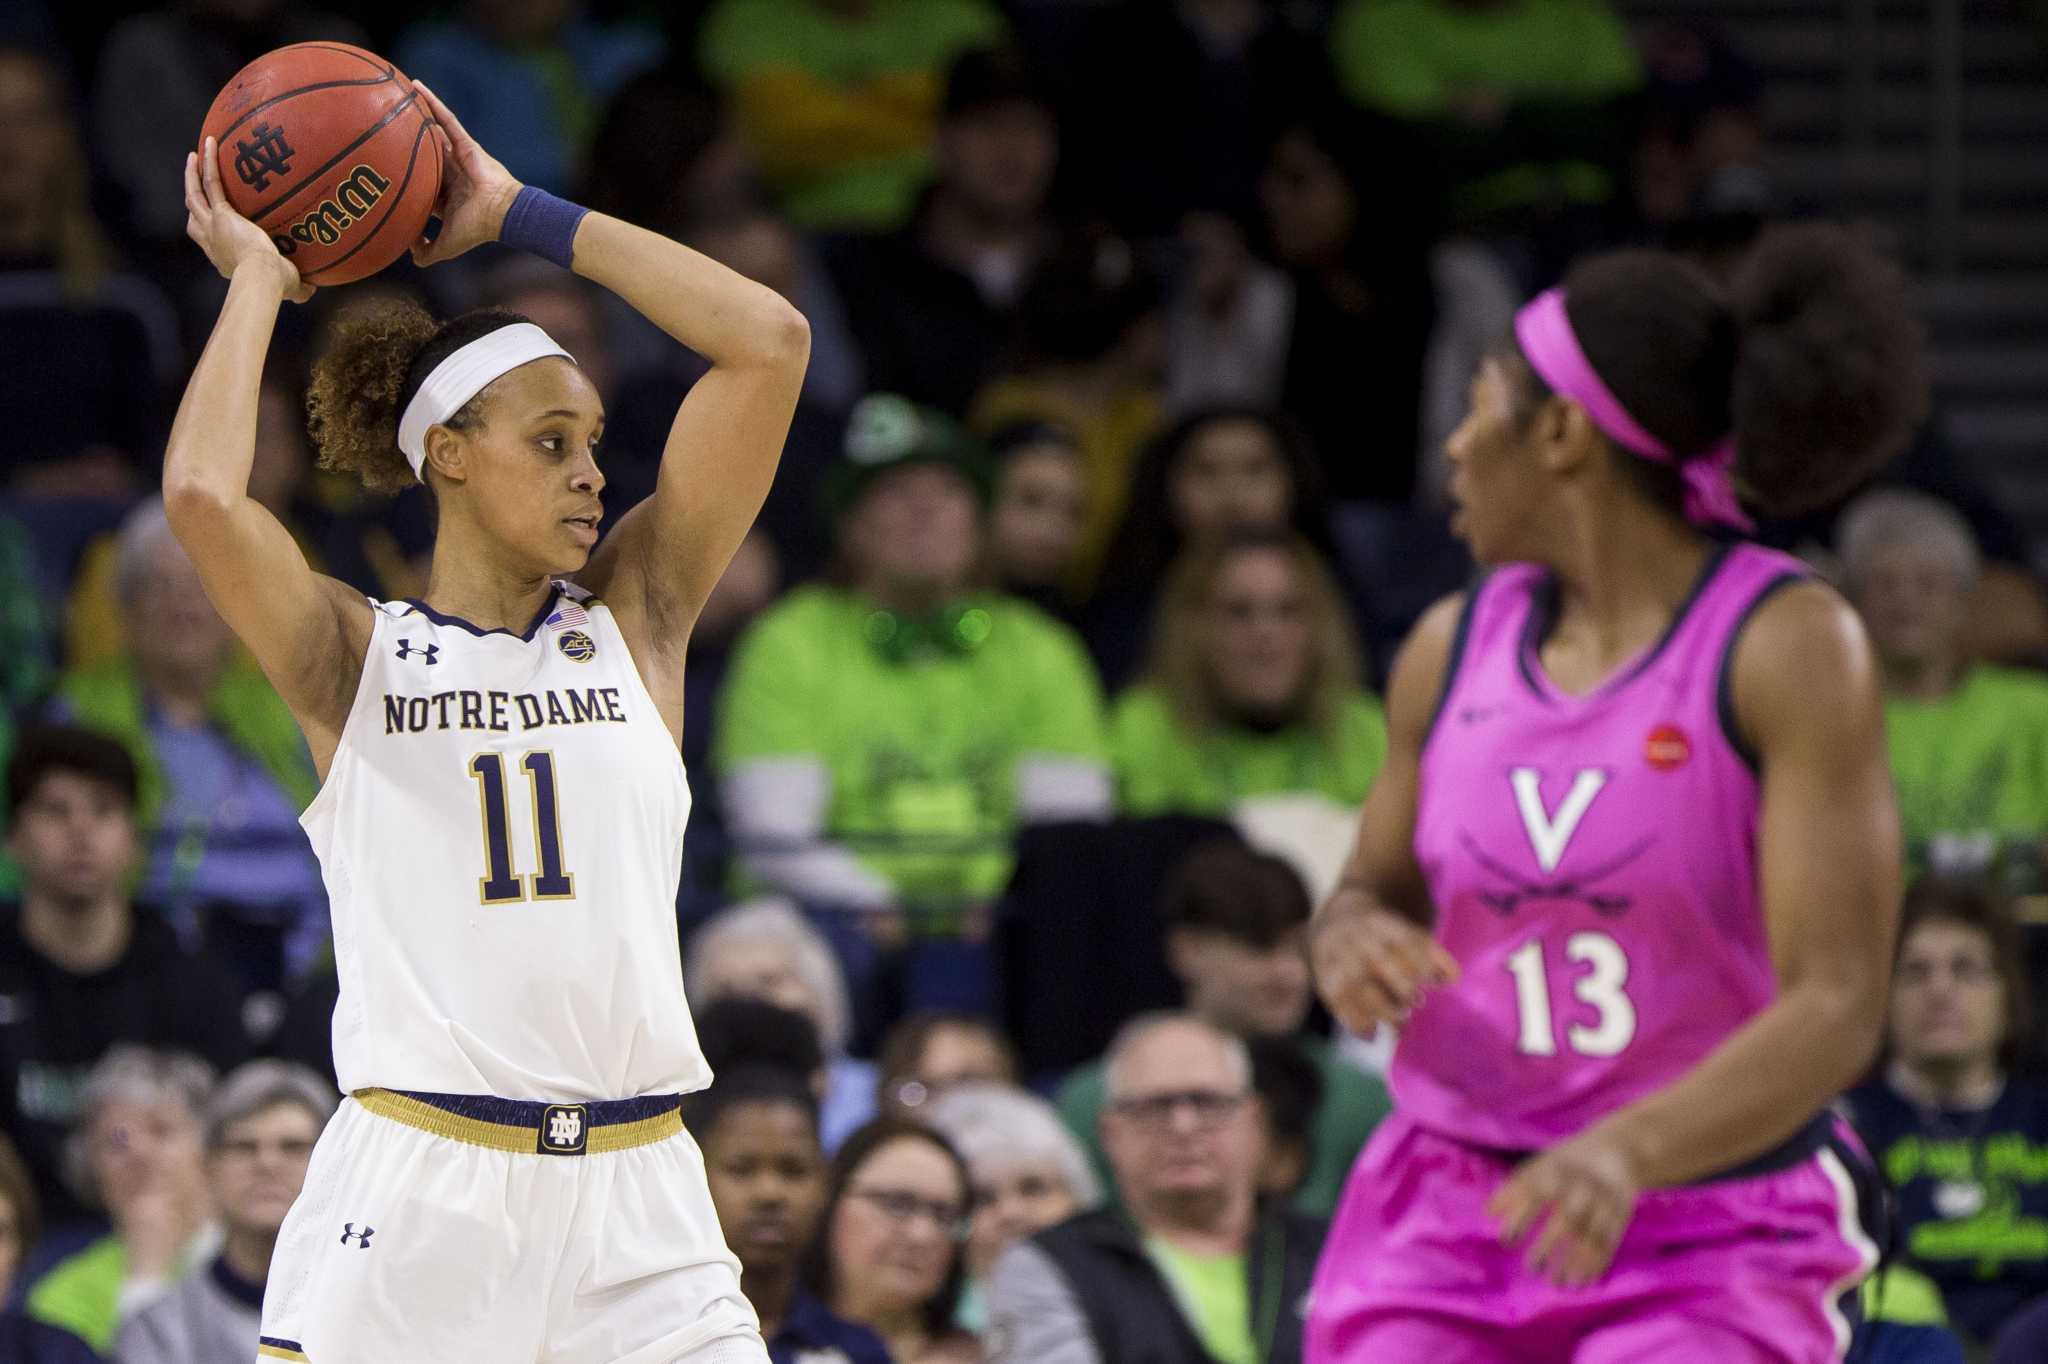 Former Houston high school stars in the Women's NCAA Tournament